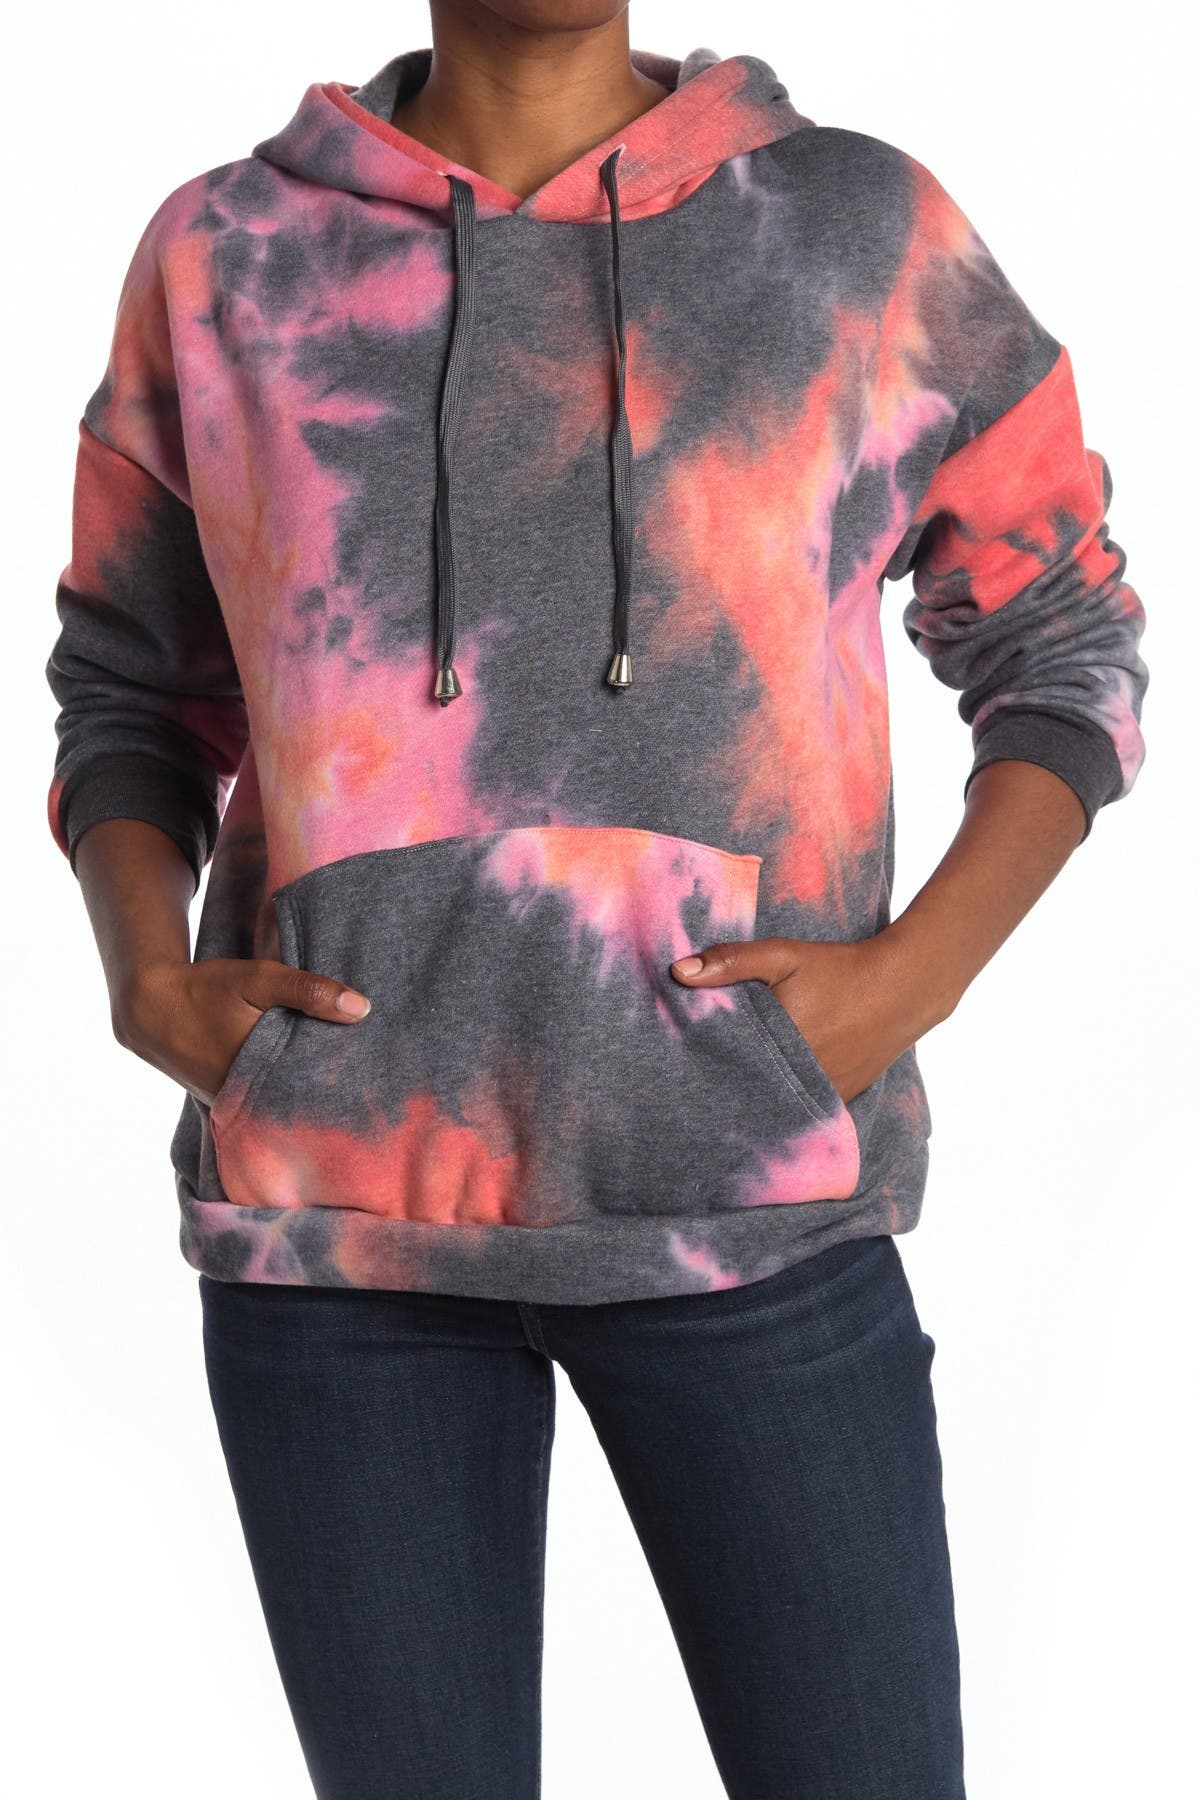 Image of Cotton Emporium Hooded Tie Dye Sweatshirt